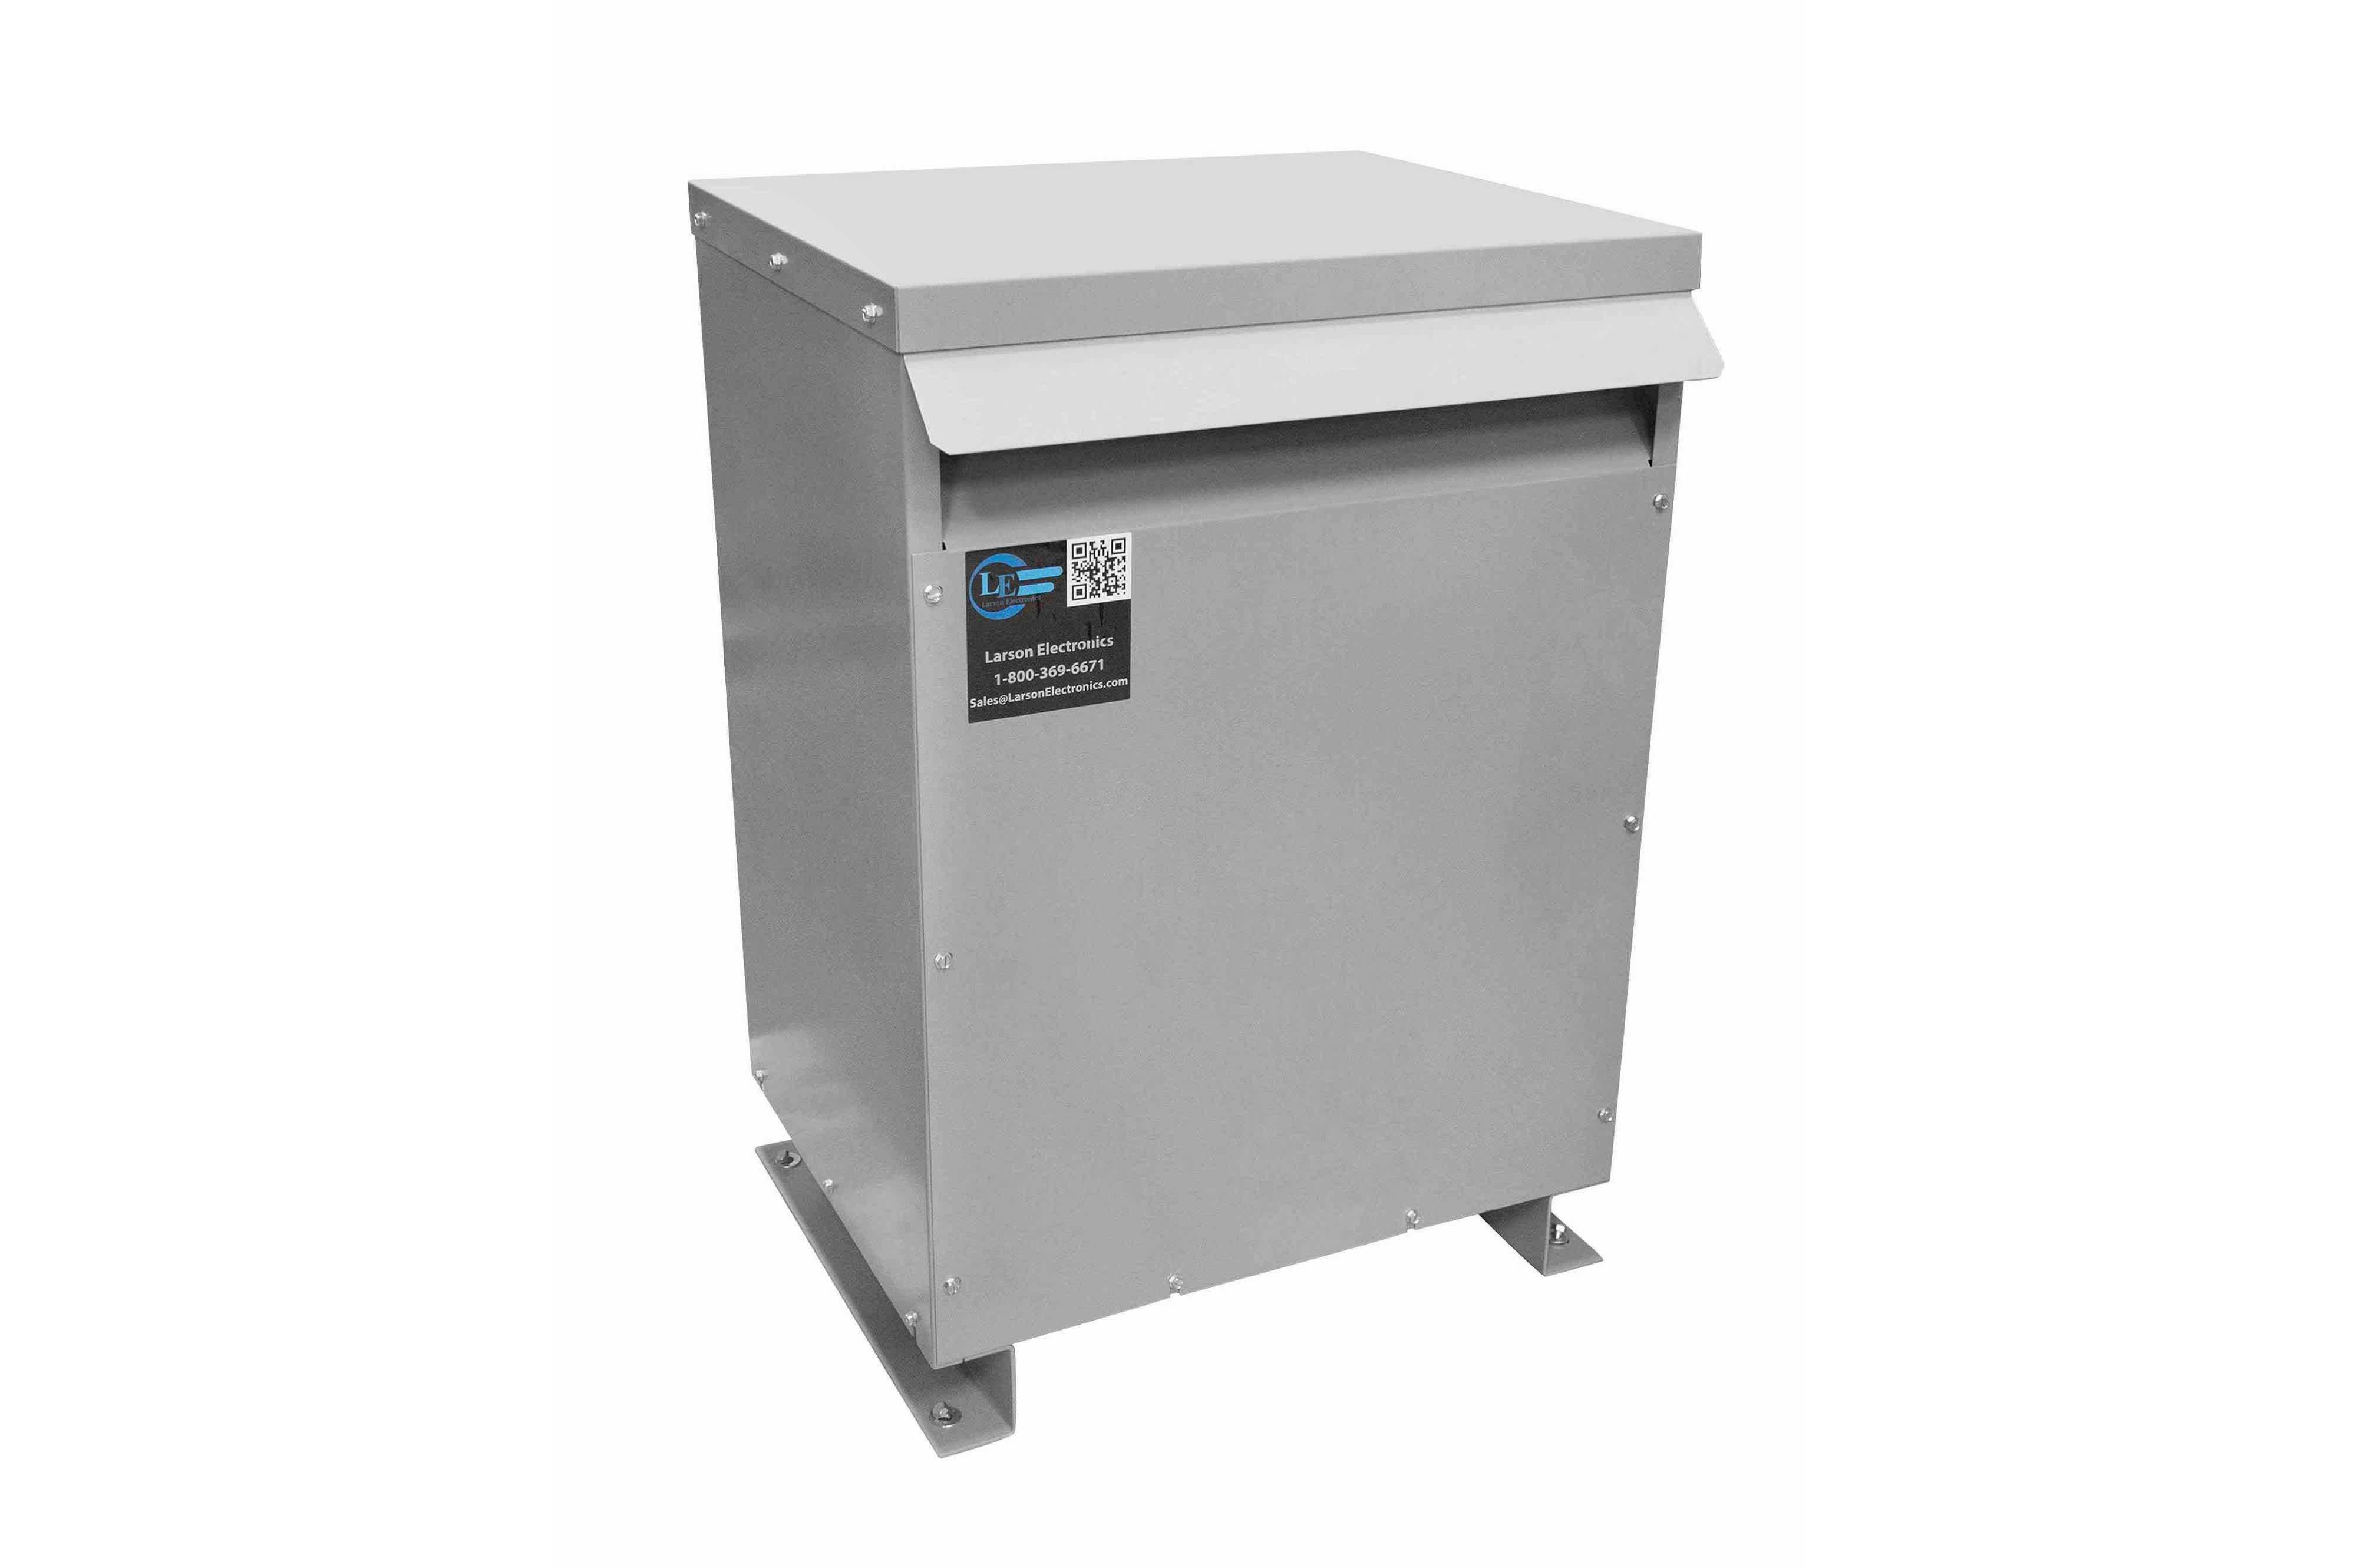 45 kVA 3PH Isolation Transformer, 480V Wye Primary, 575Y/332 Wye-N Secondary, N3R, Ventilated, 60 Hz